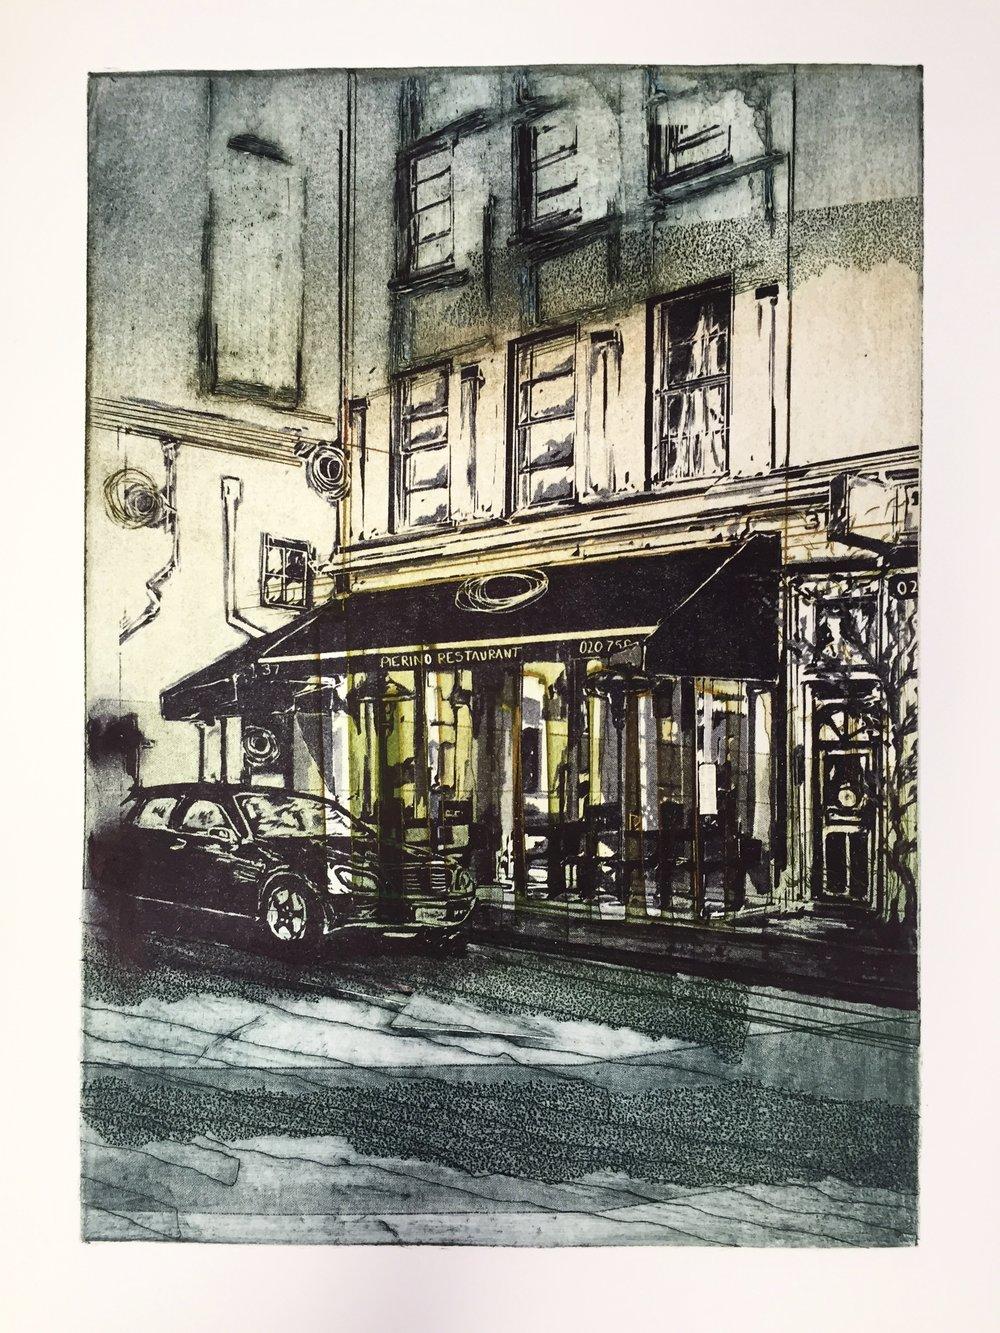 Alexandra Sivov Pierino, 2016.Collograph & polyester plate.50 x 40 cm £195.00 (framed).